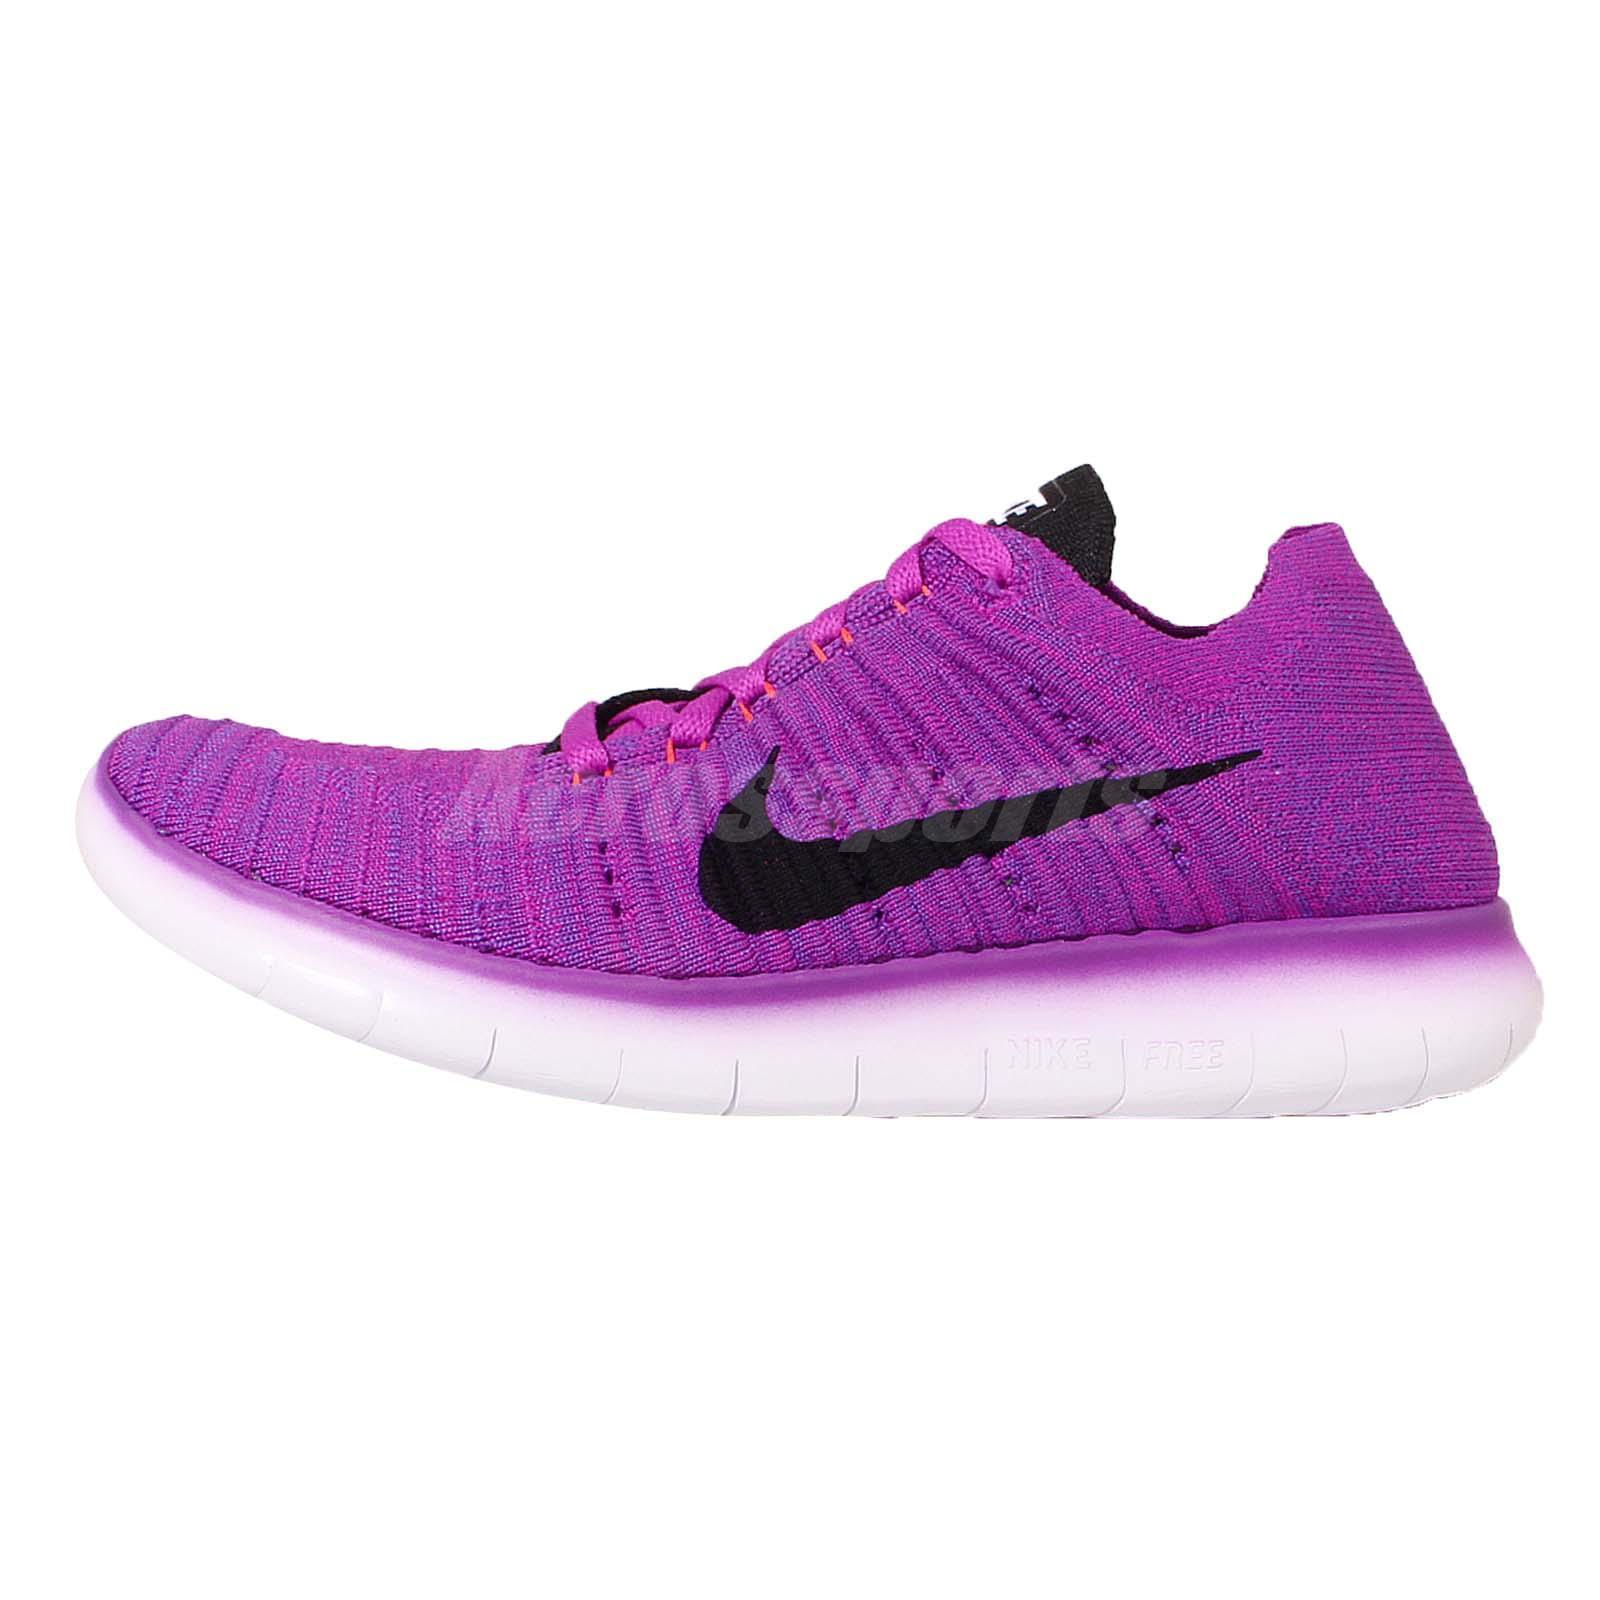 Nike free run 4.0 all black